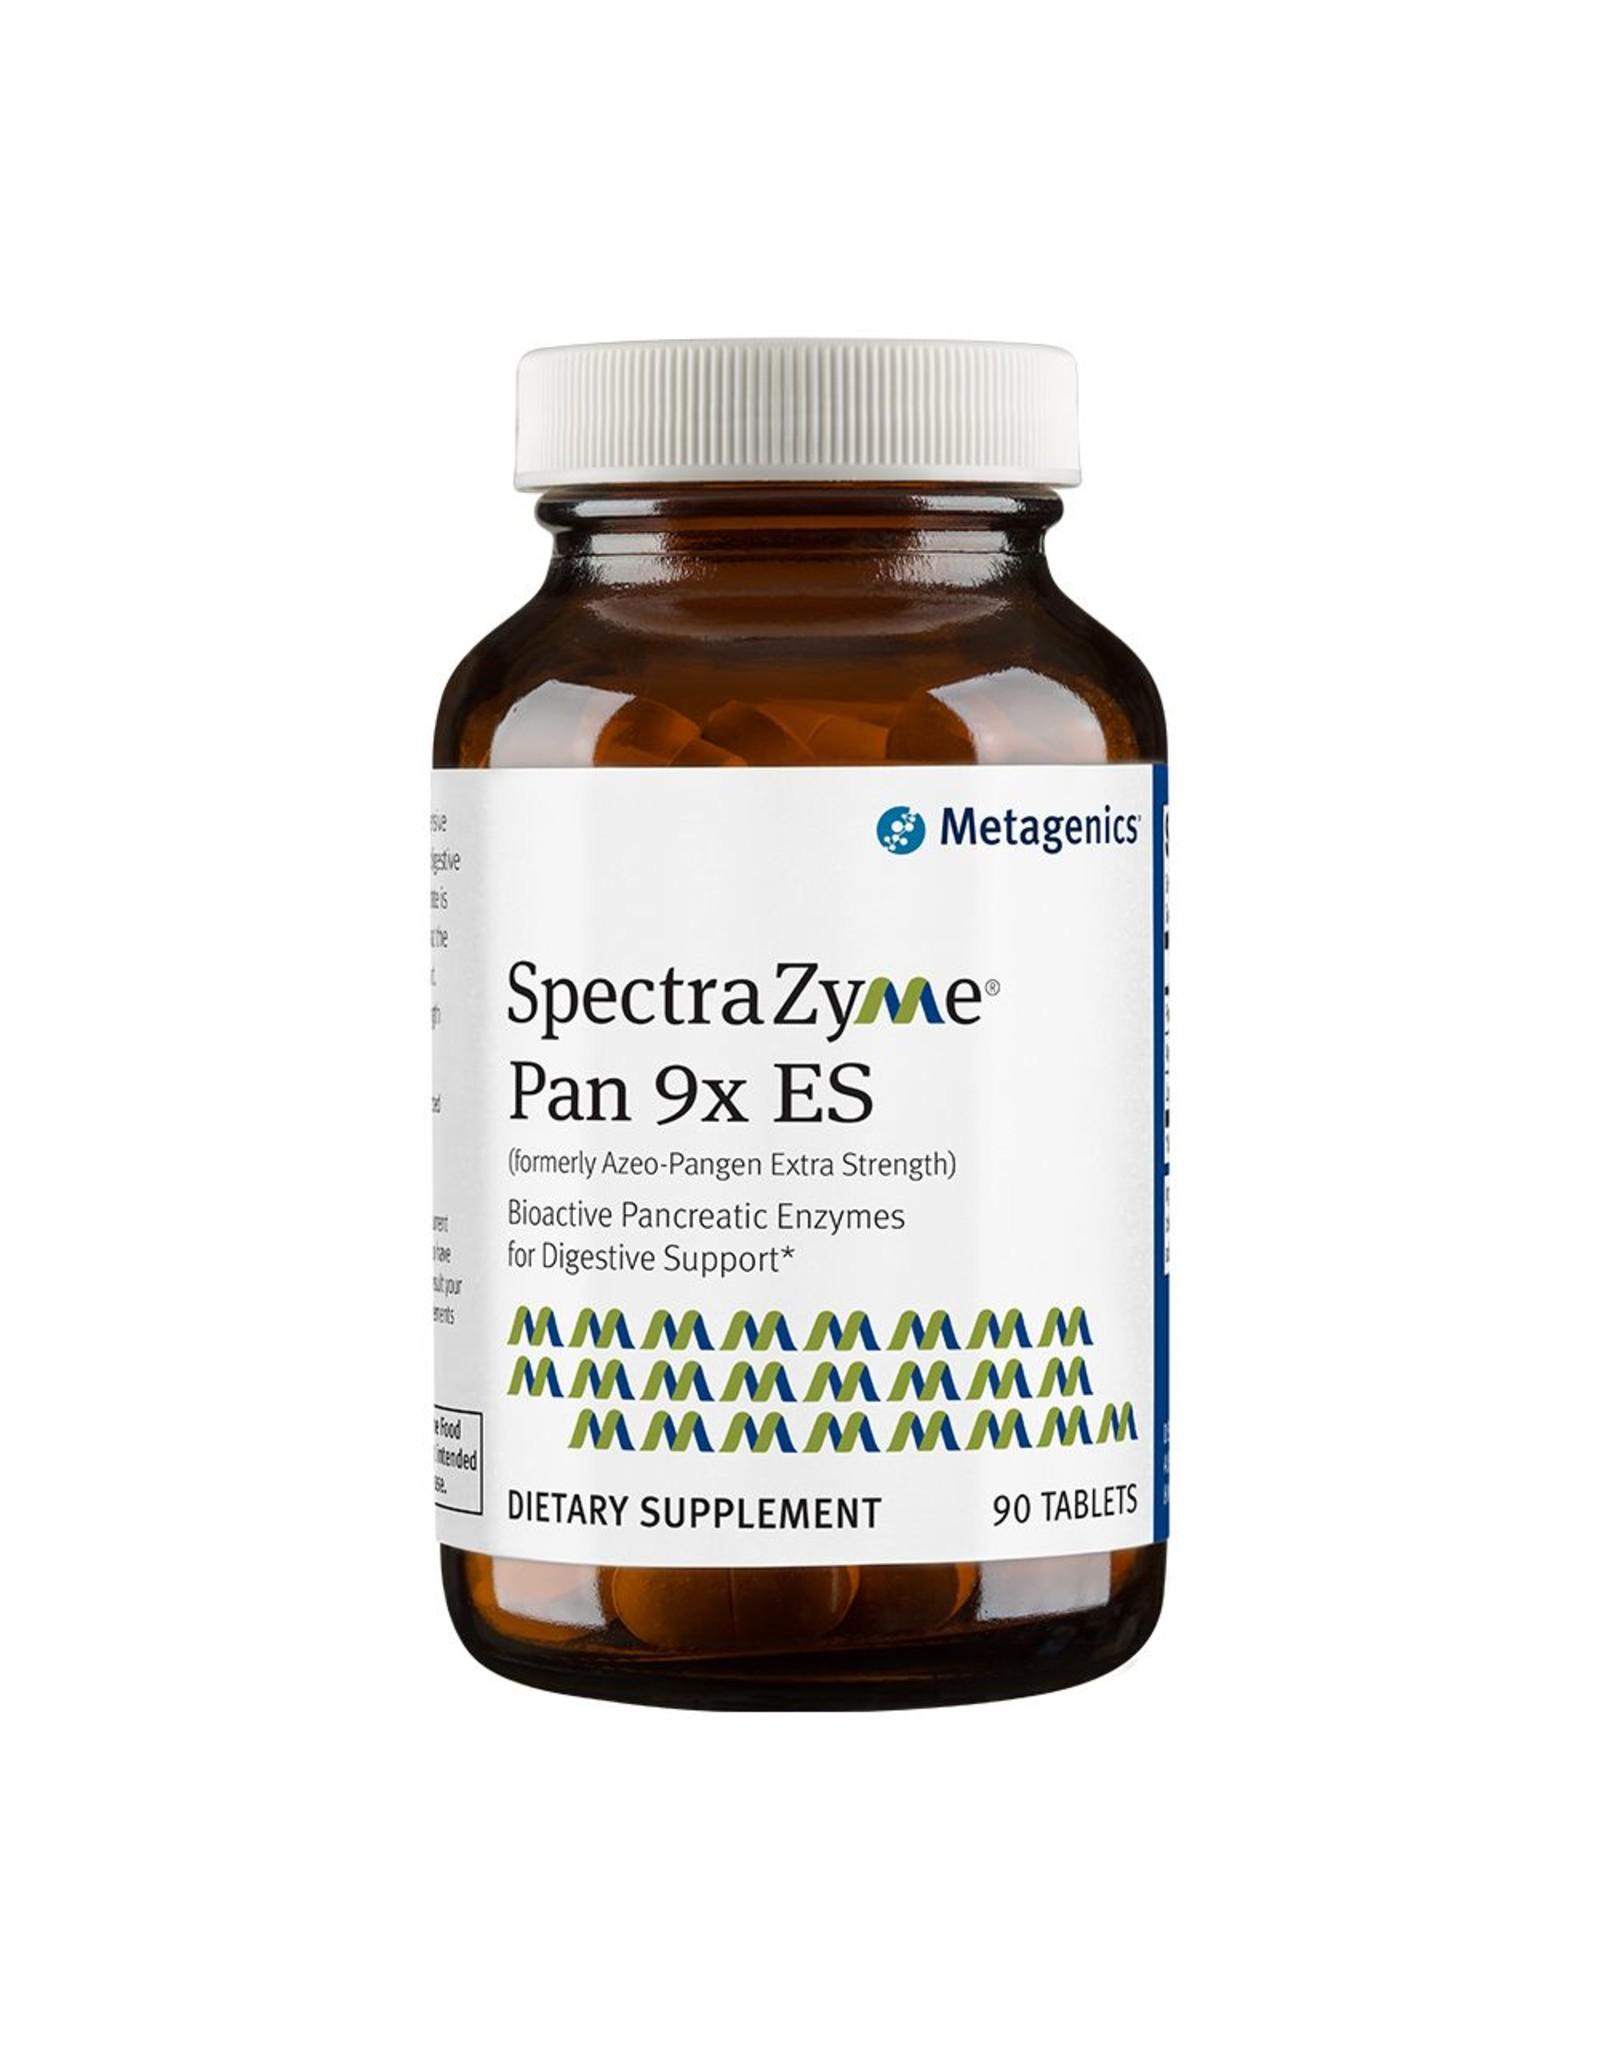 SpectraZyme® Pan 9x ES 90 ct